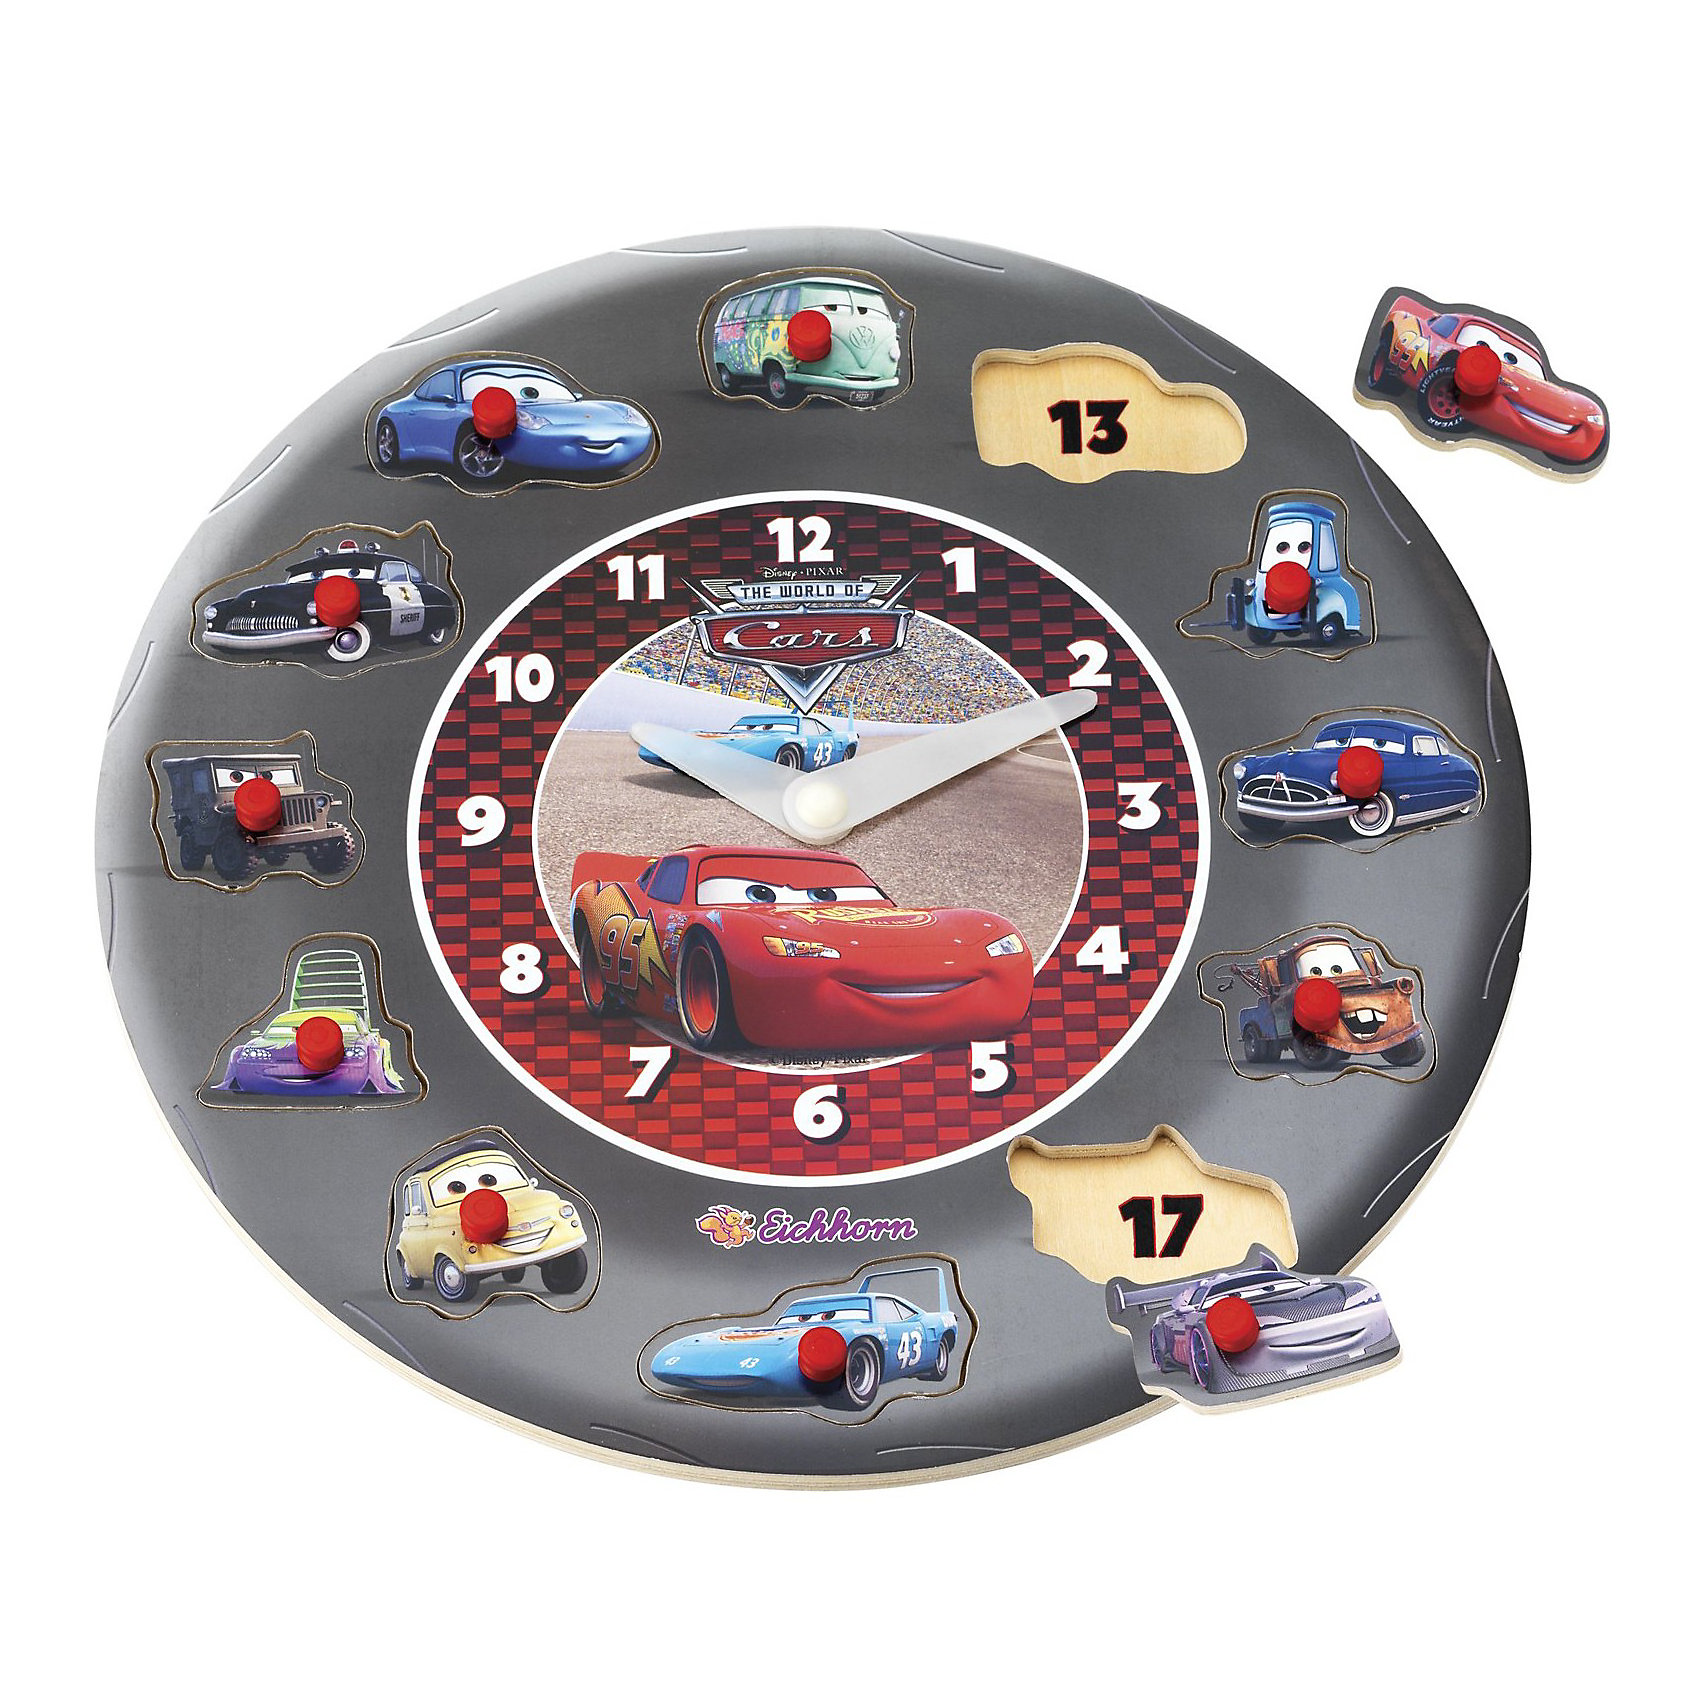 Eichhorn Часы обучающие, Тачки, Eichhorn eichhorn вагон с цистерной